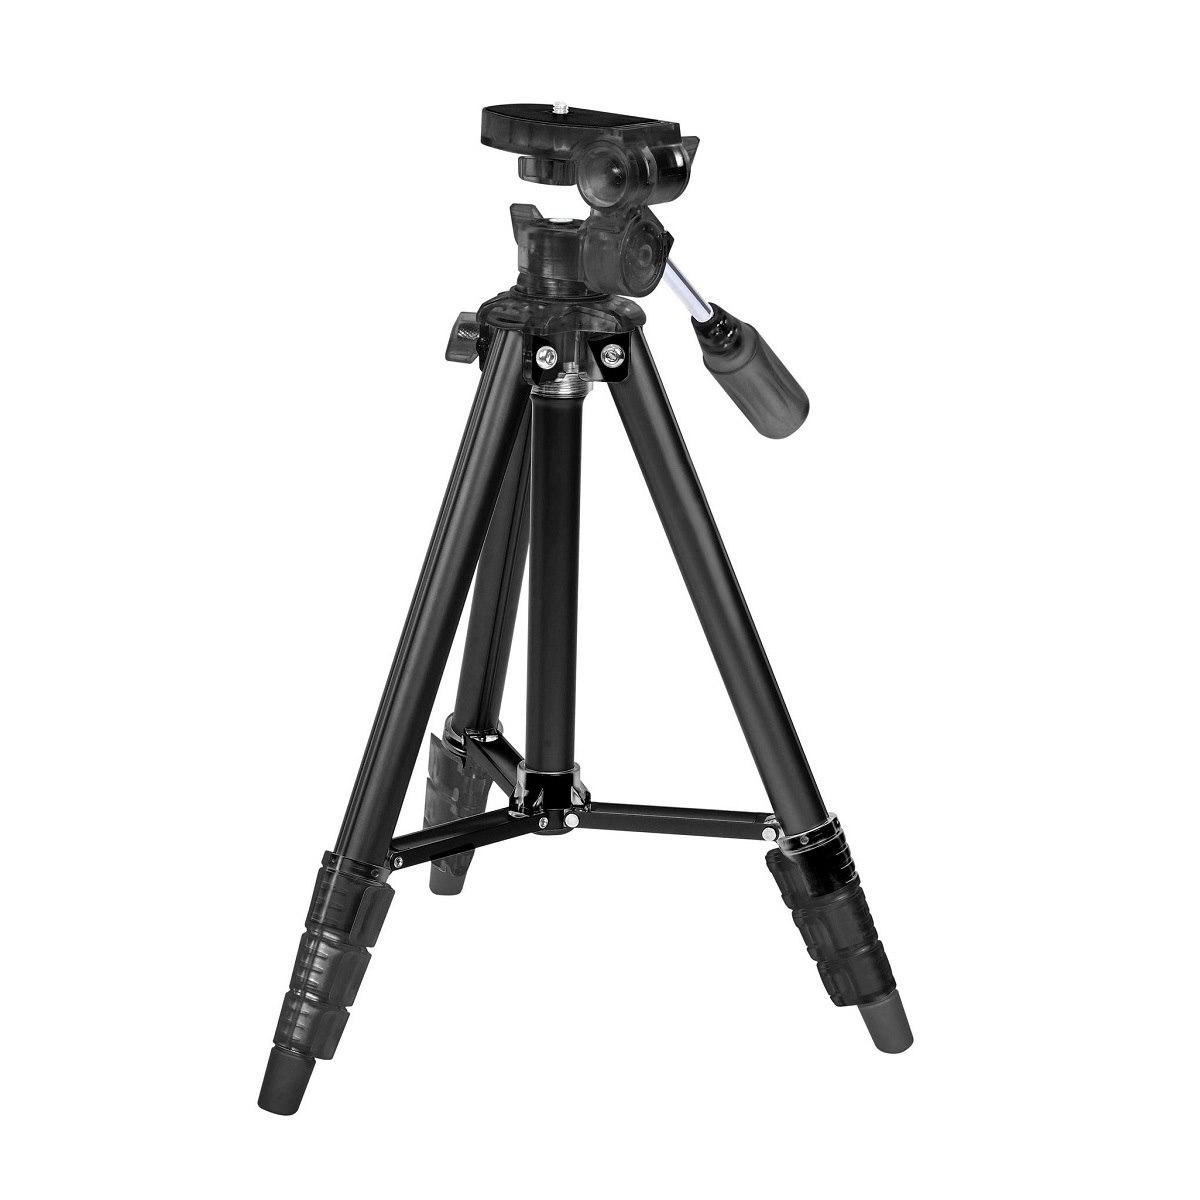 Brateck Professional Travel Tripod Digital Camera Camcorder Video Tilt Pan Head